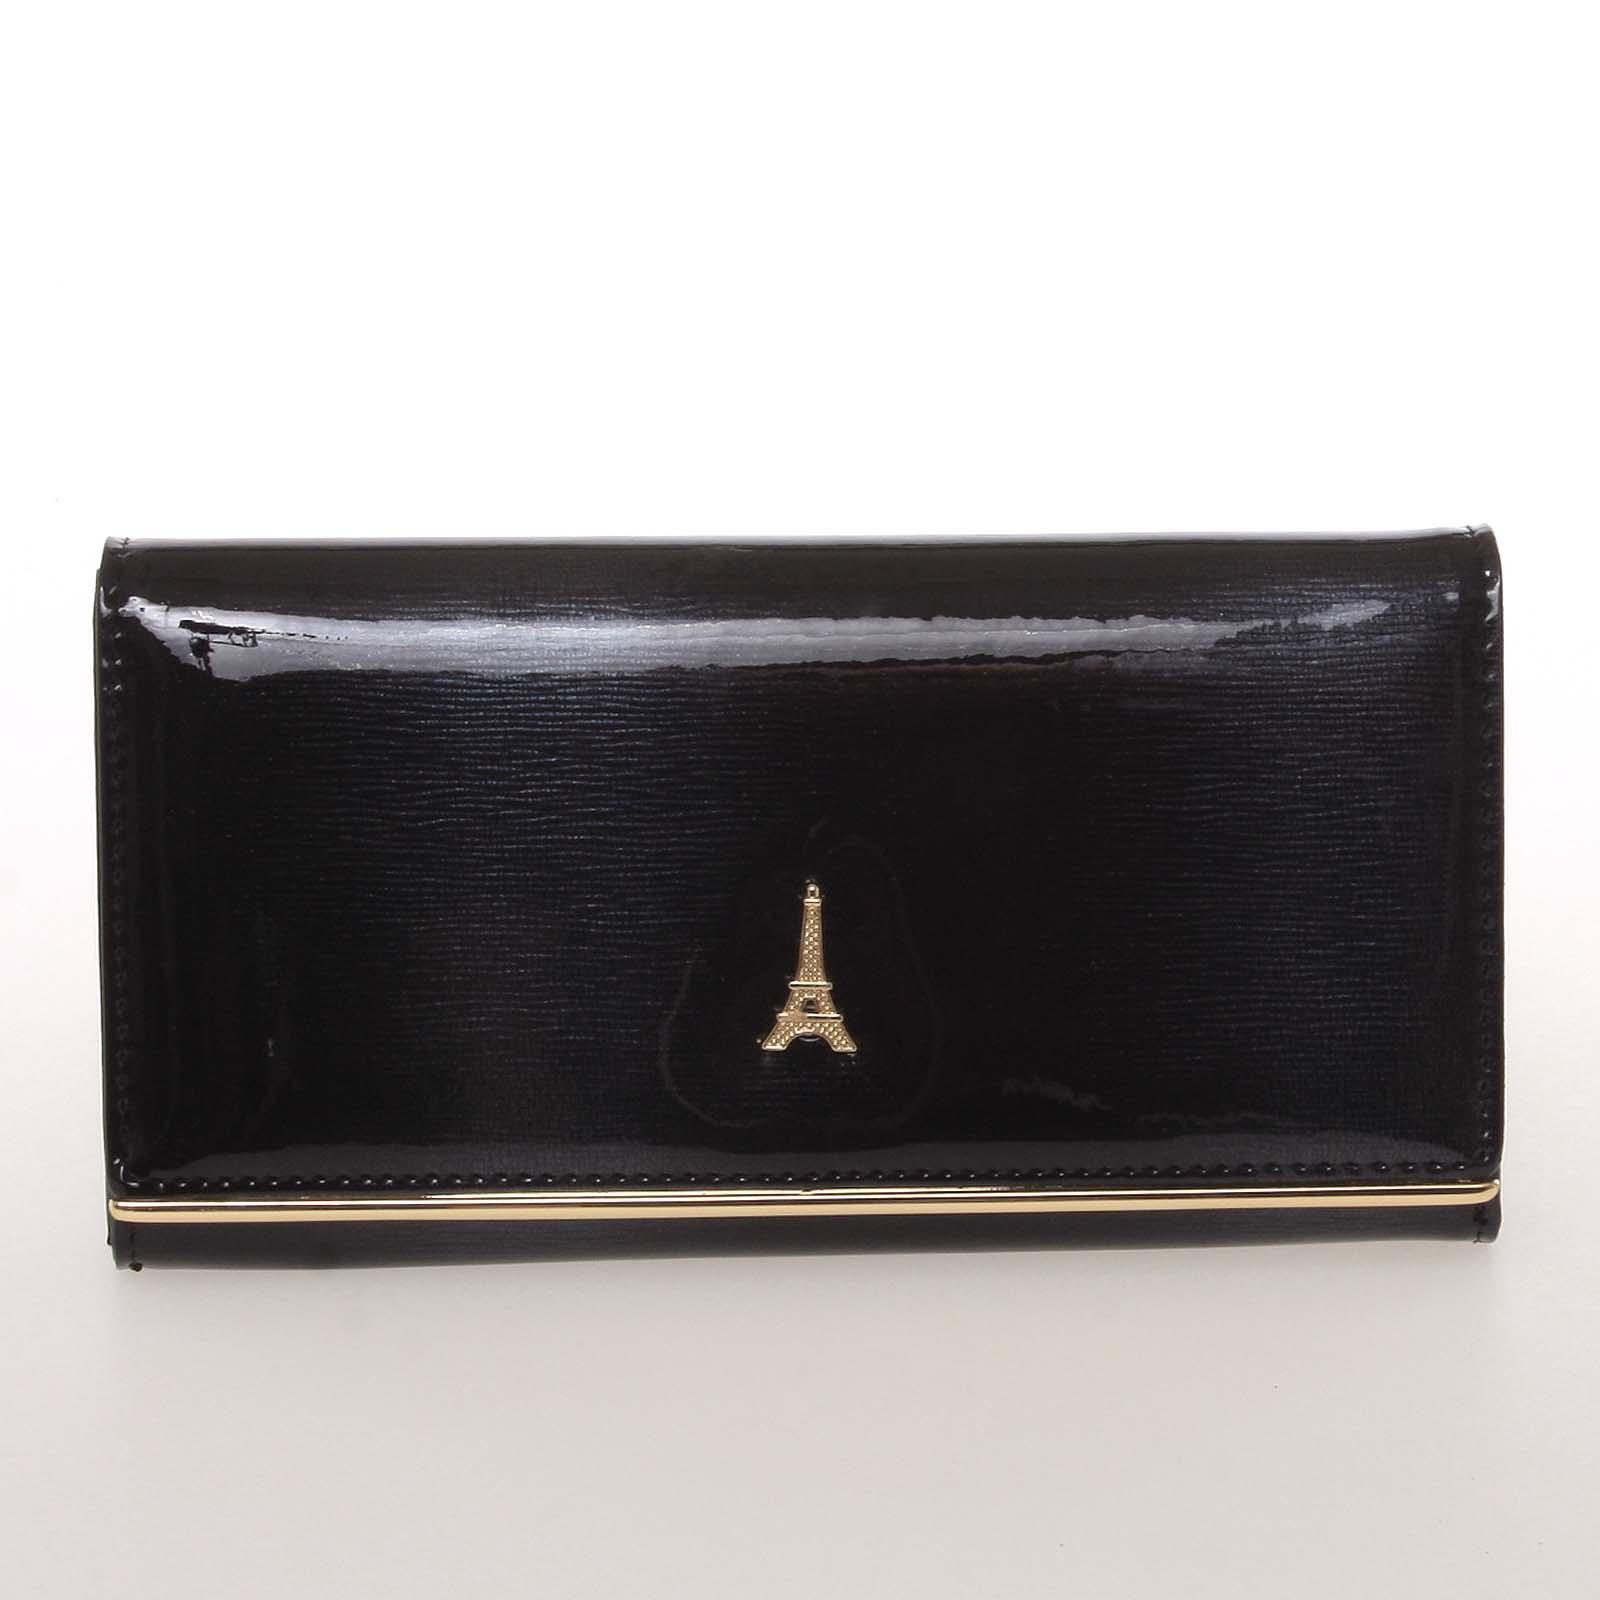 Jedinečná kožená lakovaná dámska peňaženka čierna - PARIS 64003DSHK